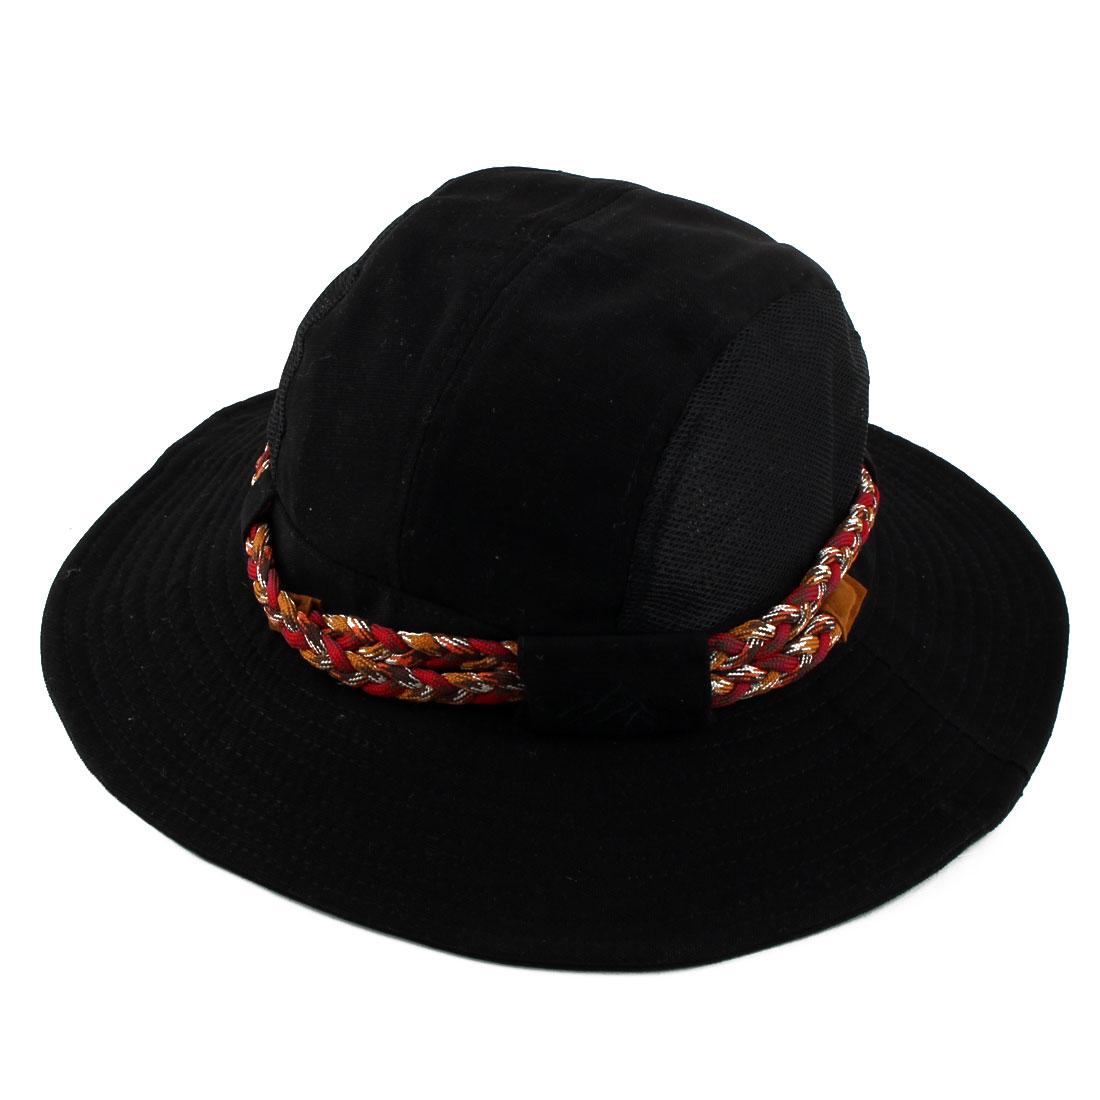 Fisherman Cotton Blends Climbing Hunting Adjustable Strap Wide Brim Protective Bucket Summer Cap Fishing Hat Black